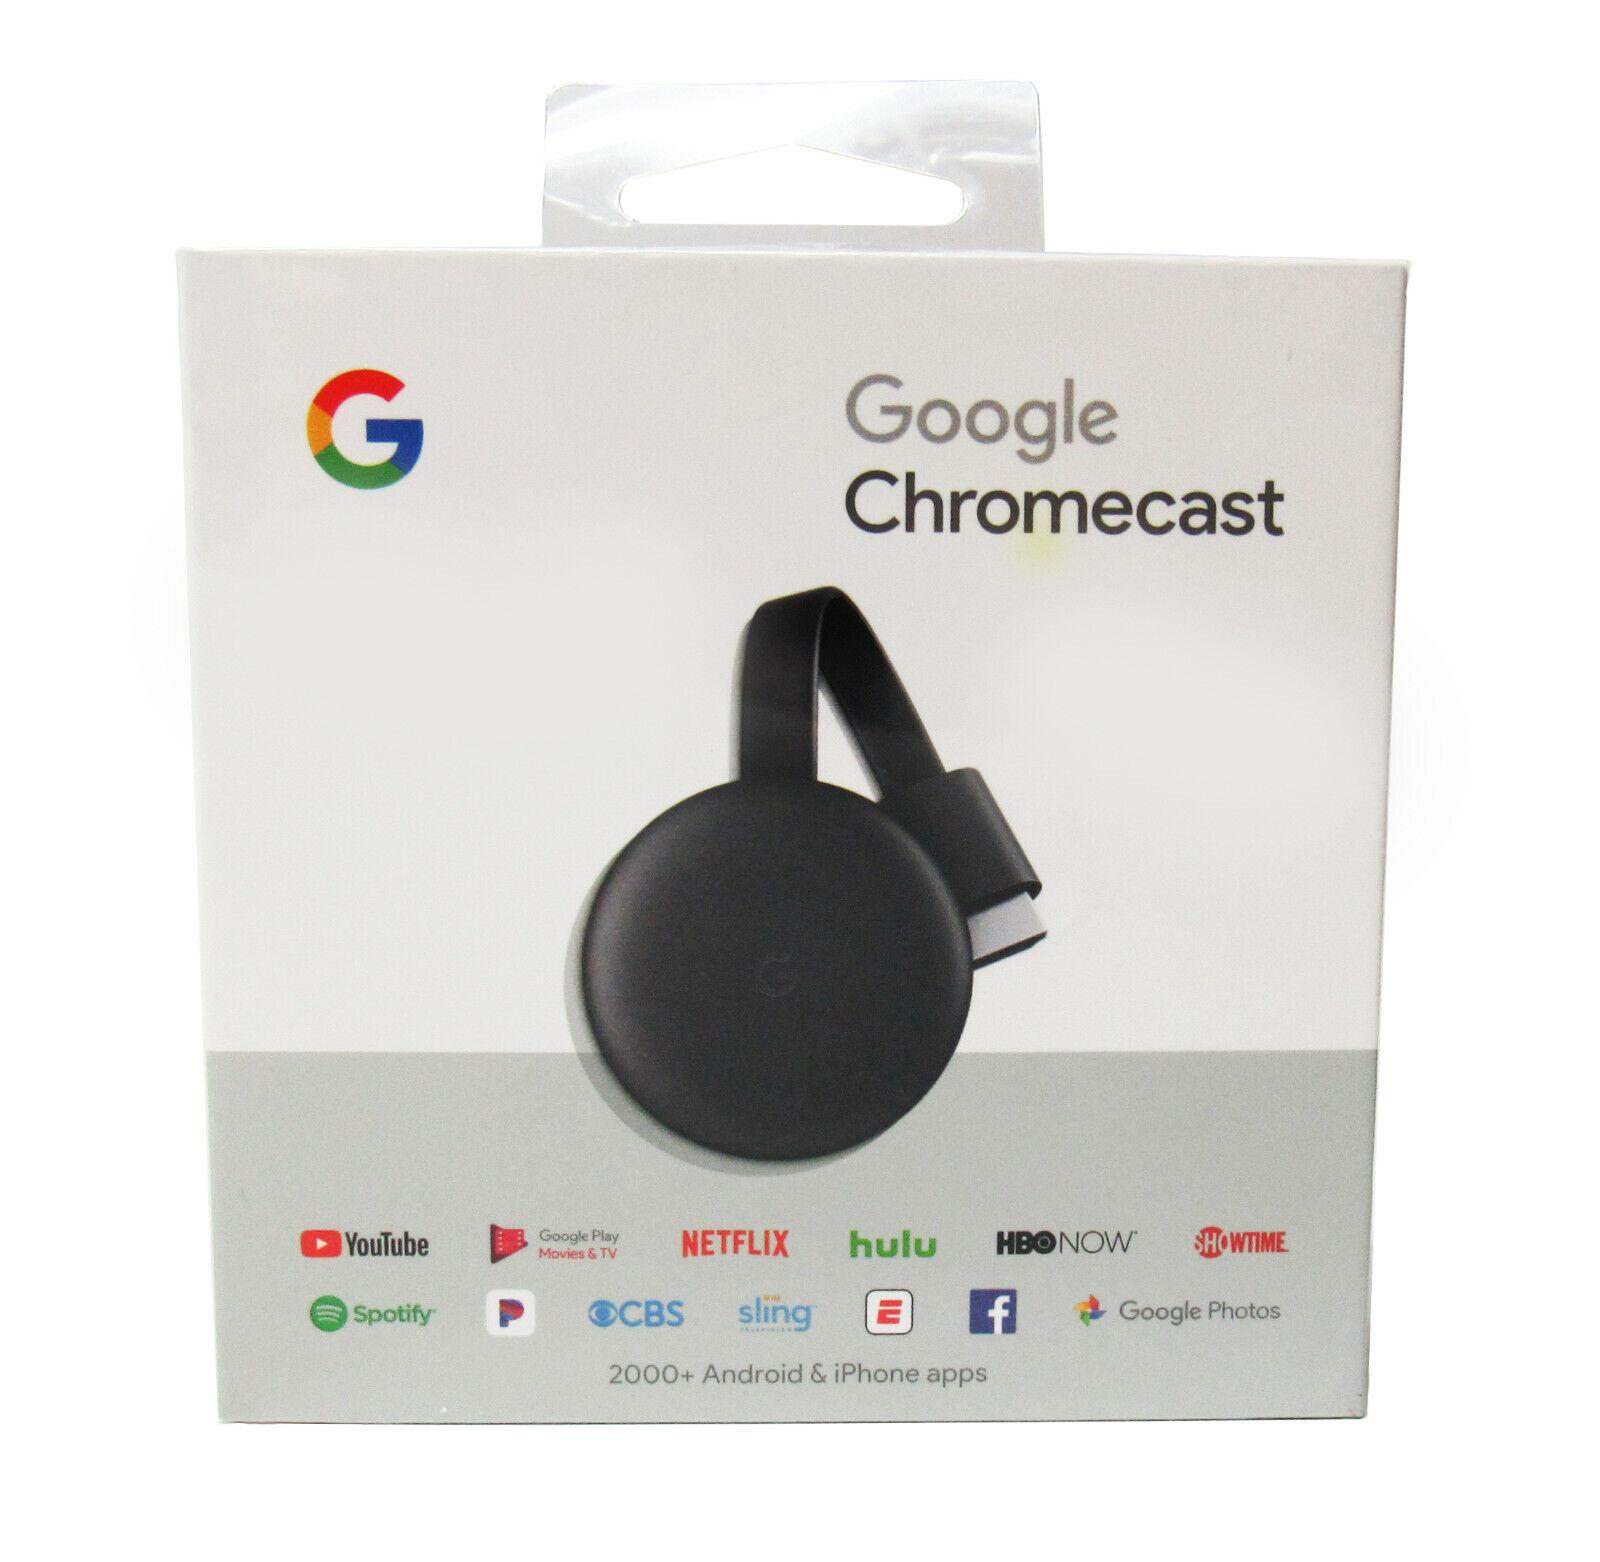 s-l1600 Google Chromecast (3rd Generation) 1080p Streaming Media Player  w/ Wi-Fi